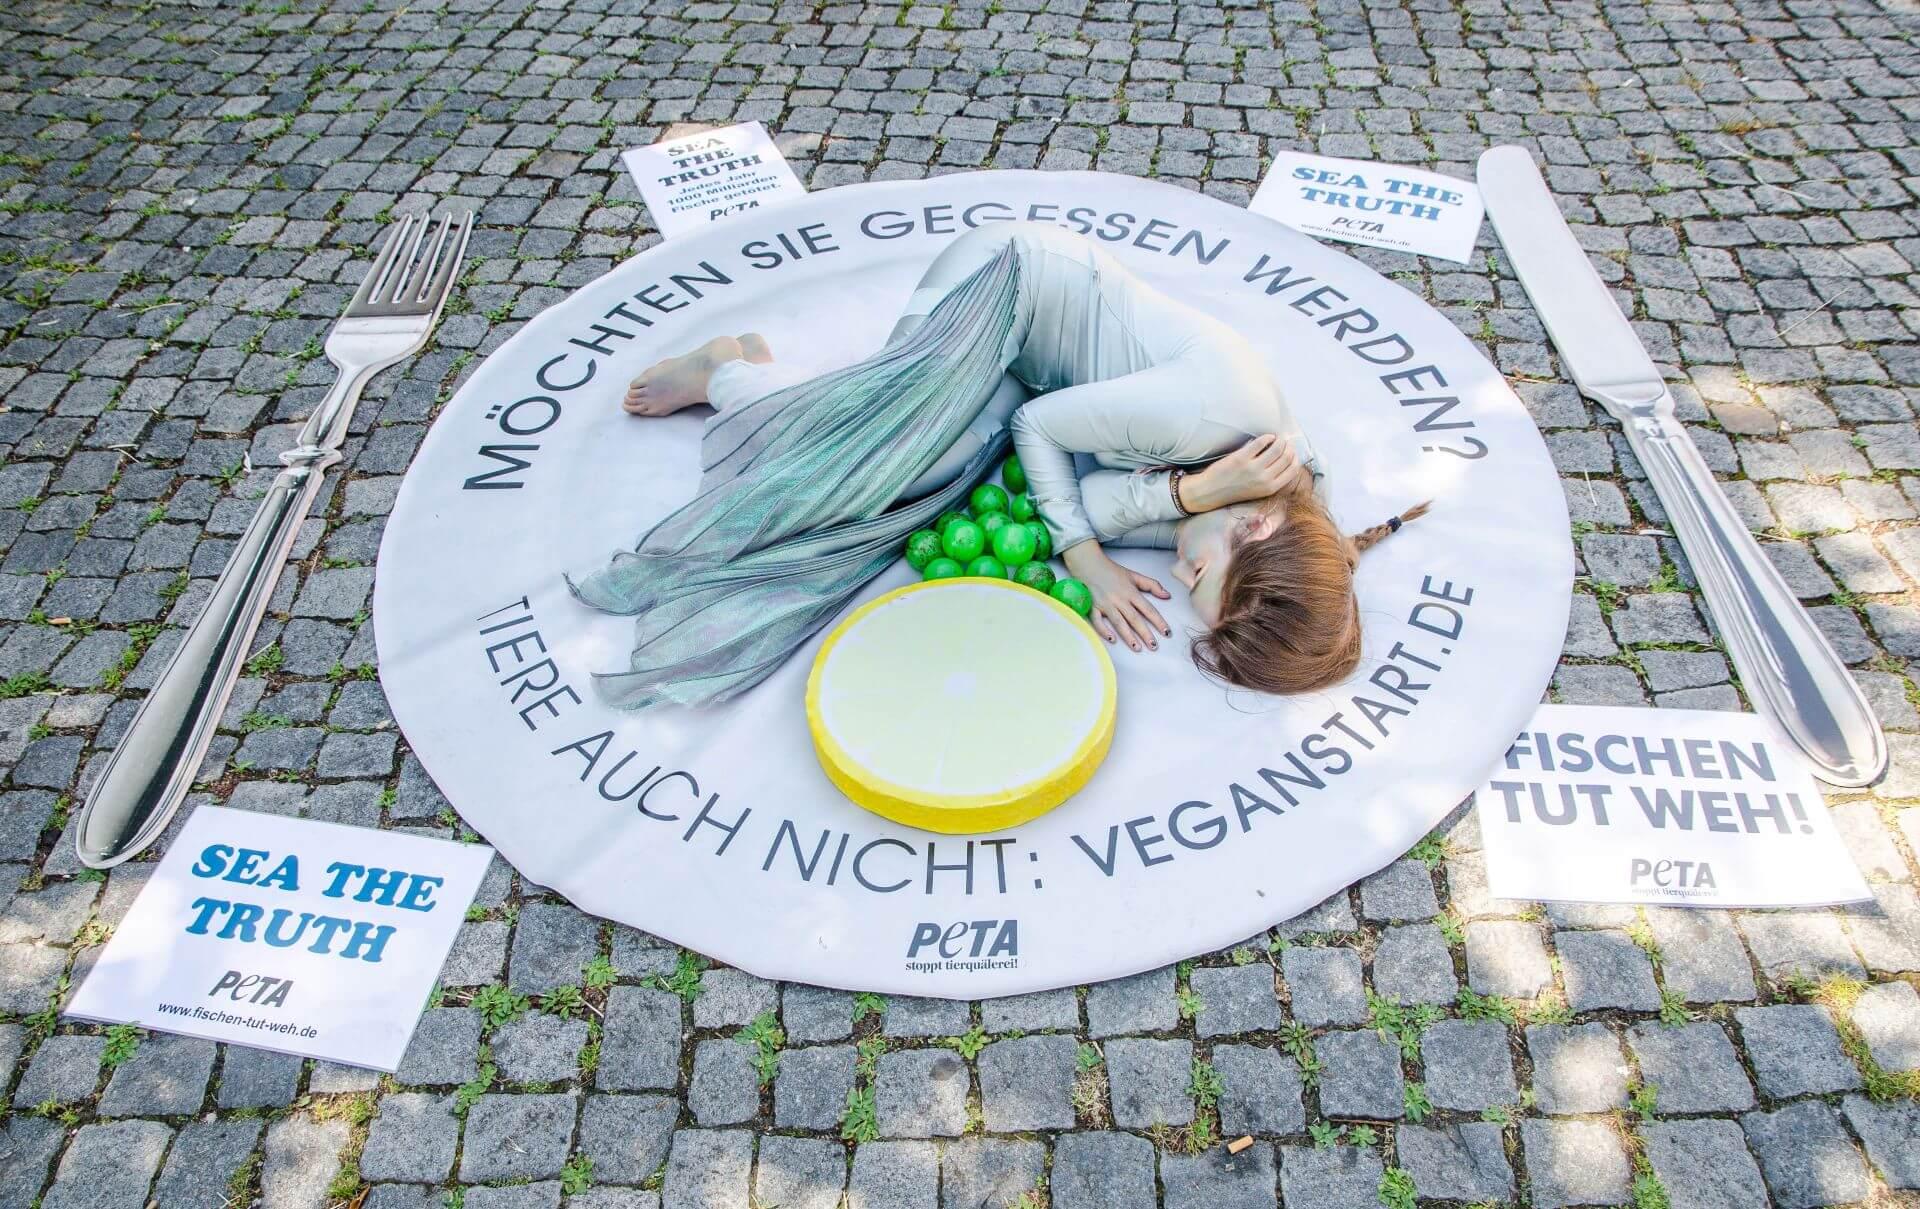 Copyright Peta Deutschland e.V.